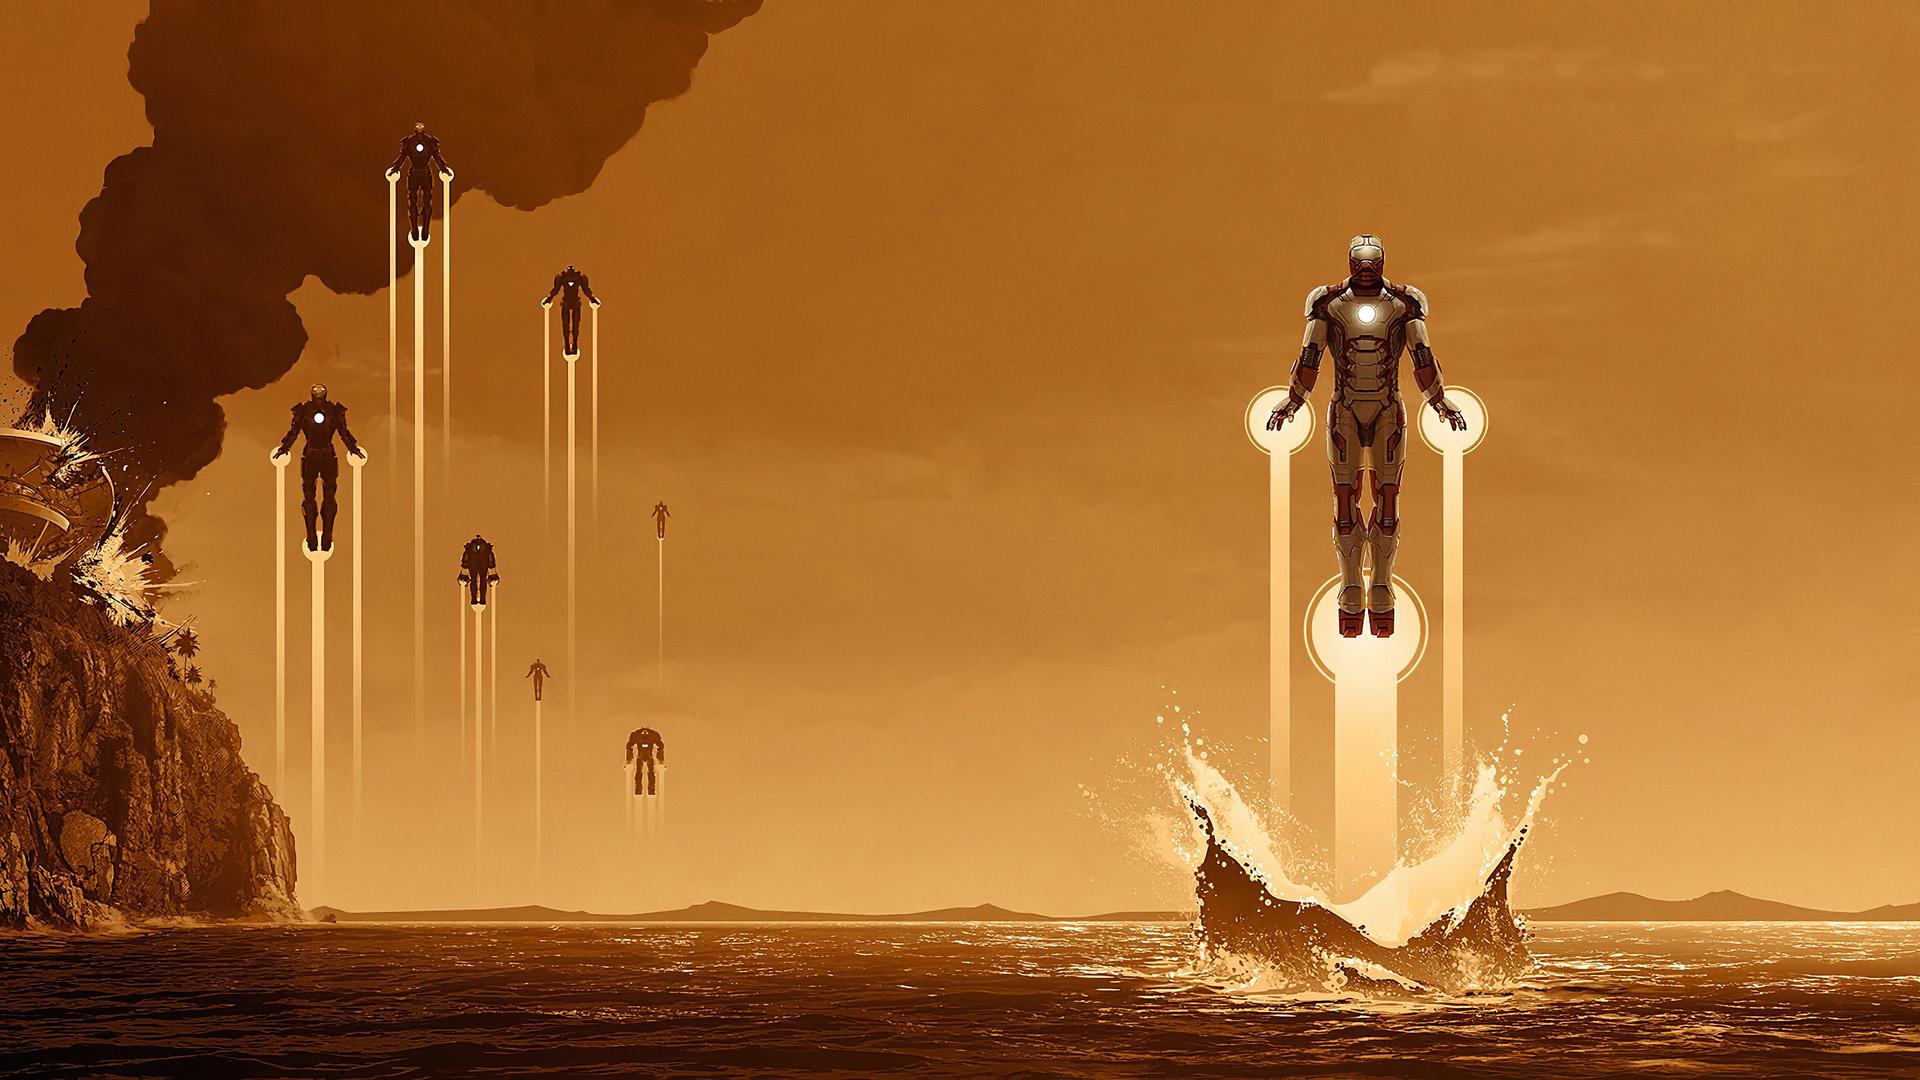 iron-man-3-arts-ww.jpg